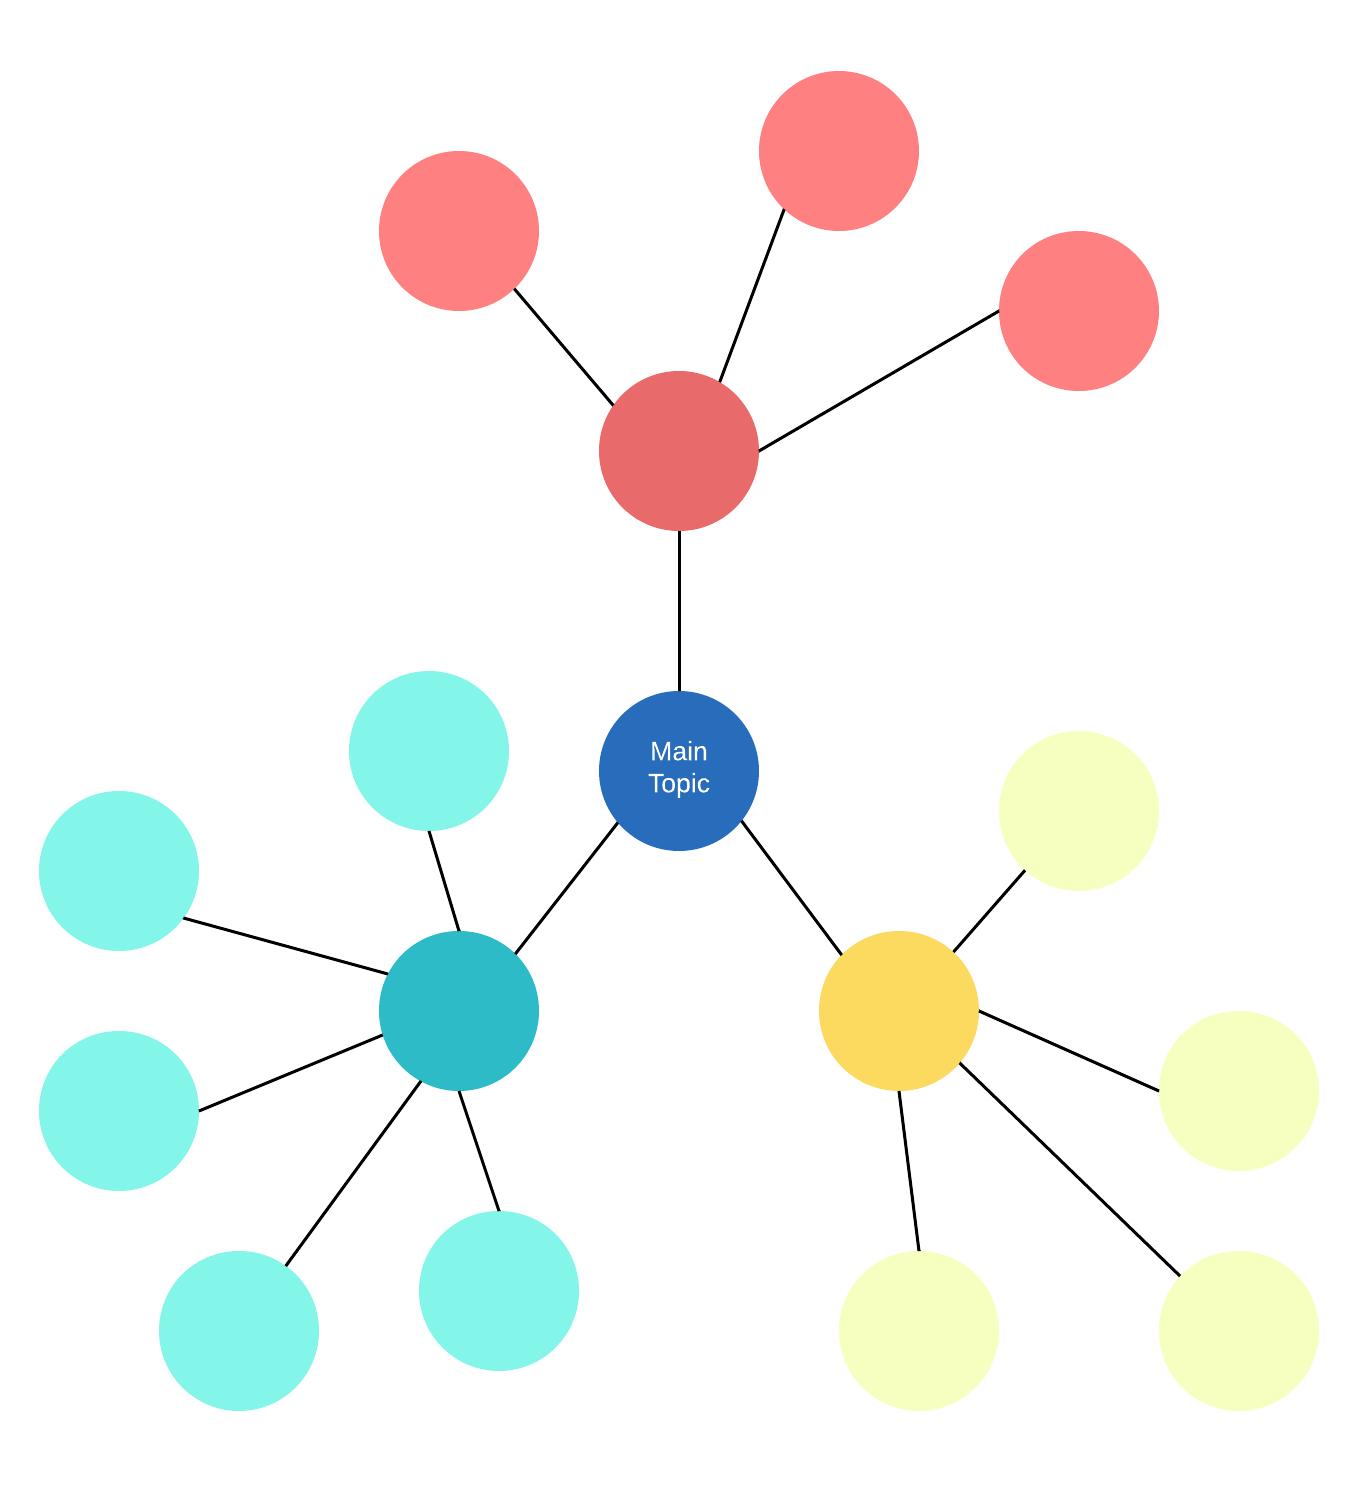 blank-cluster-diagram-template - Analytics Vidhya